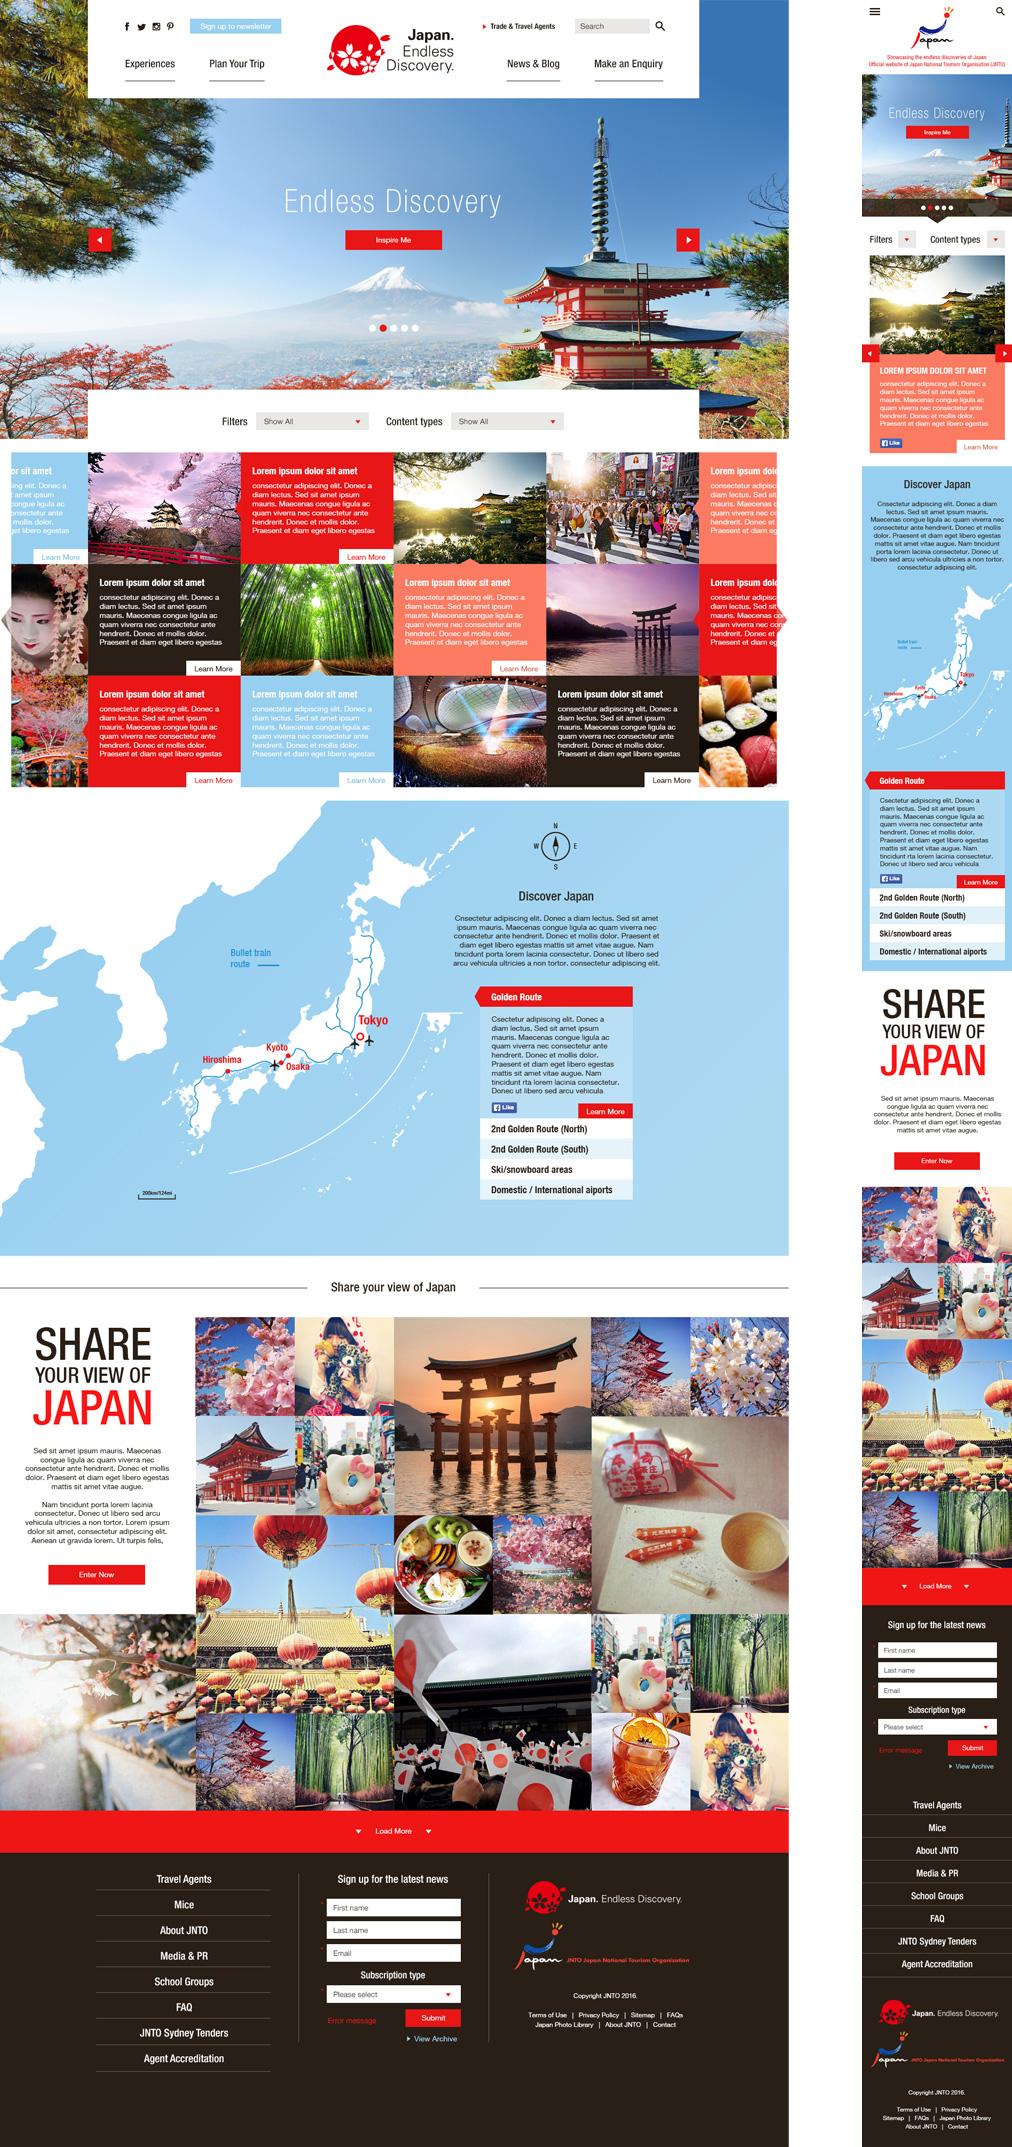 designs01.jpg